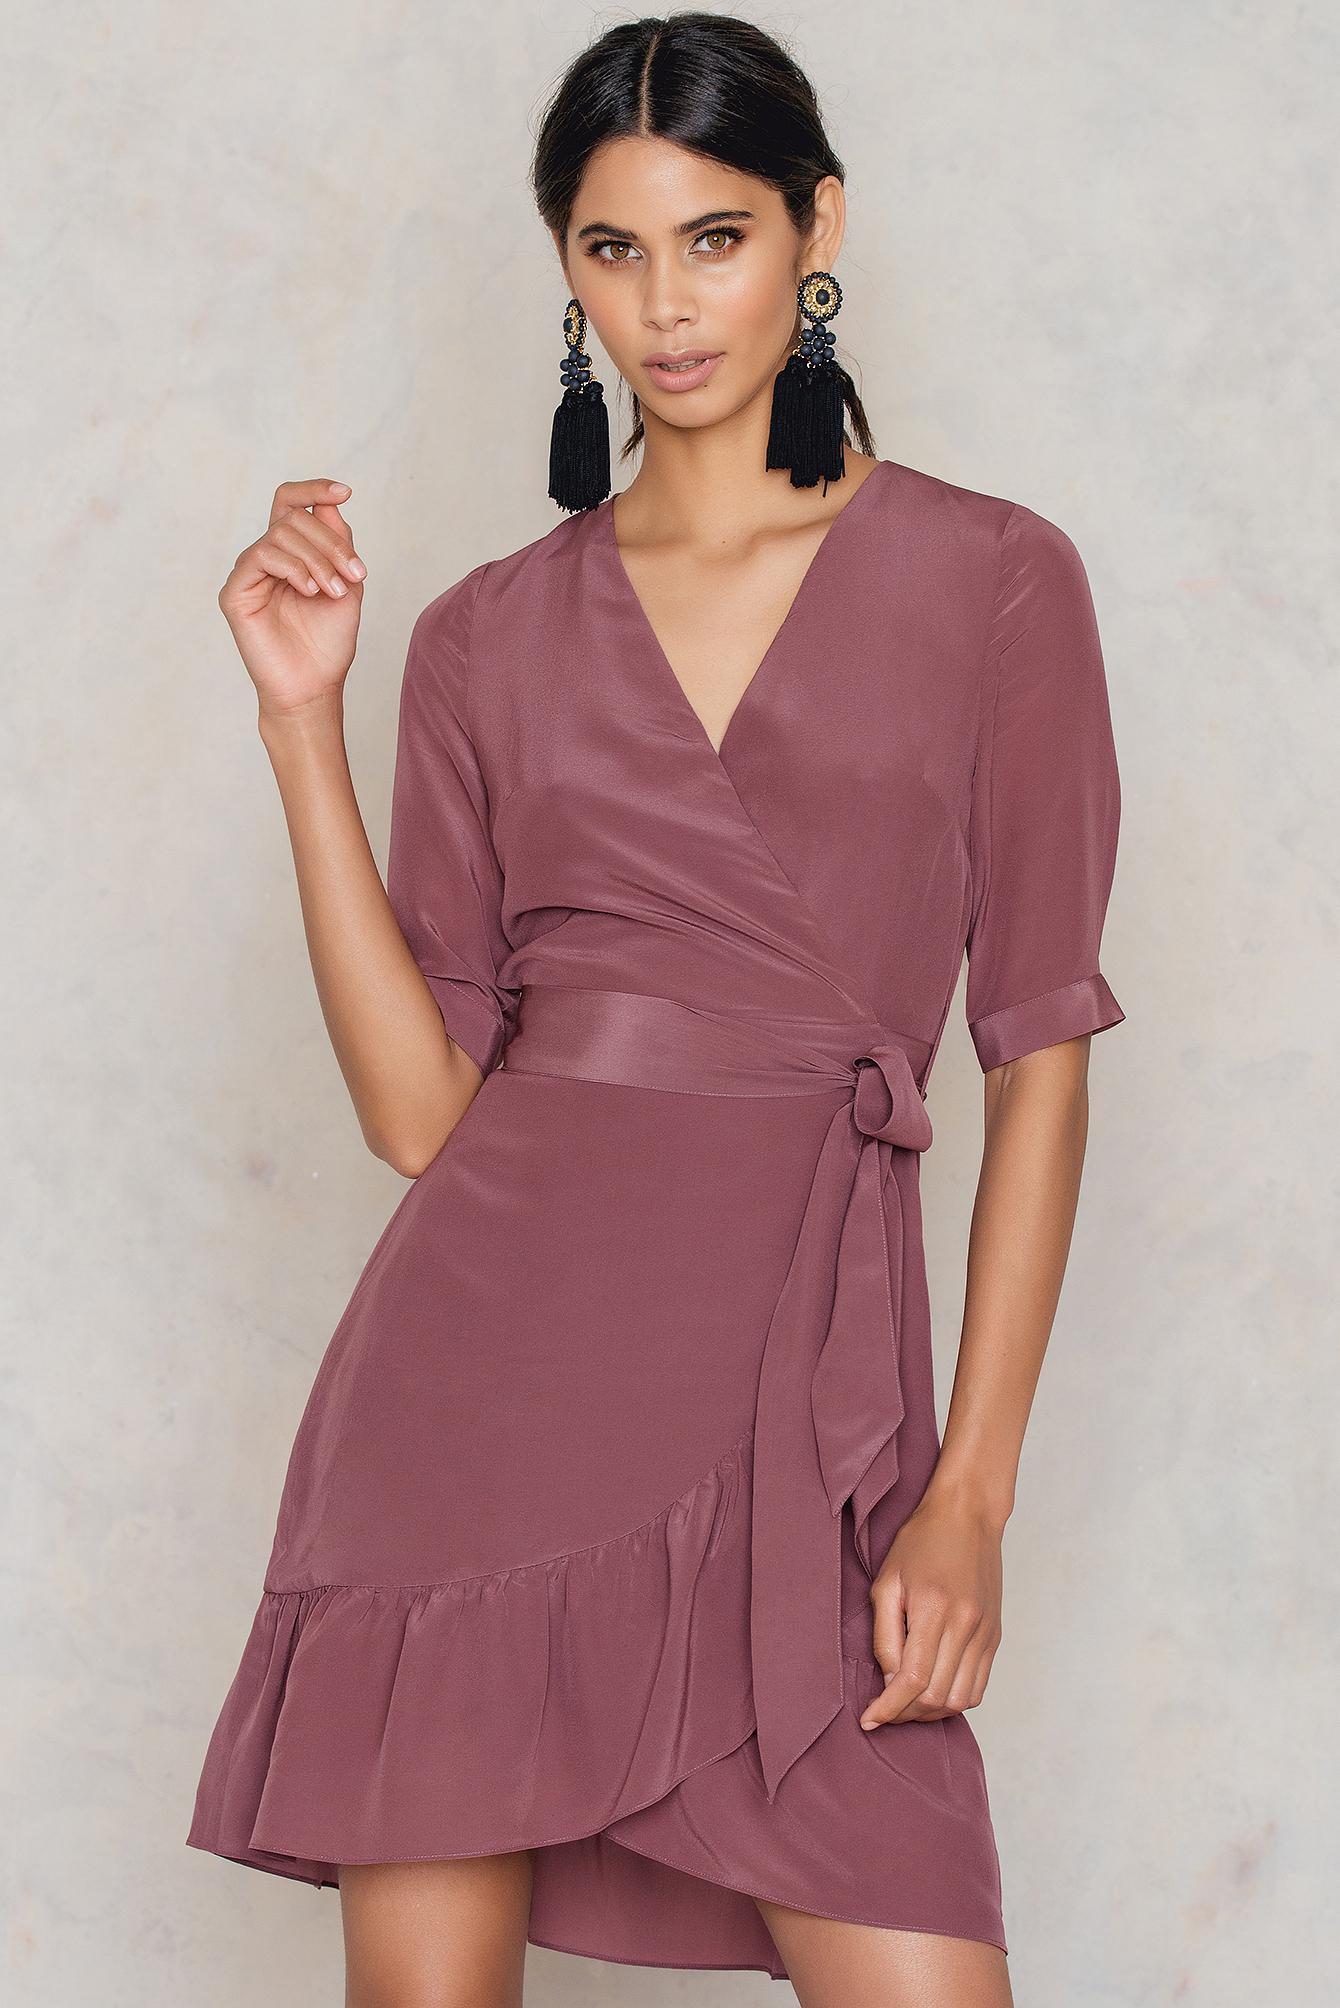 Fwss High Pressure Dress - Purple